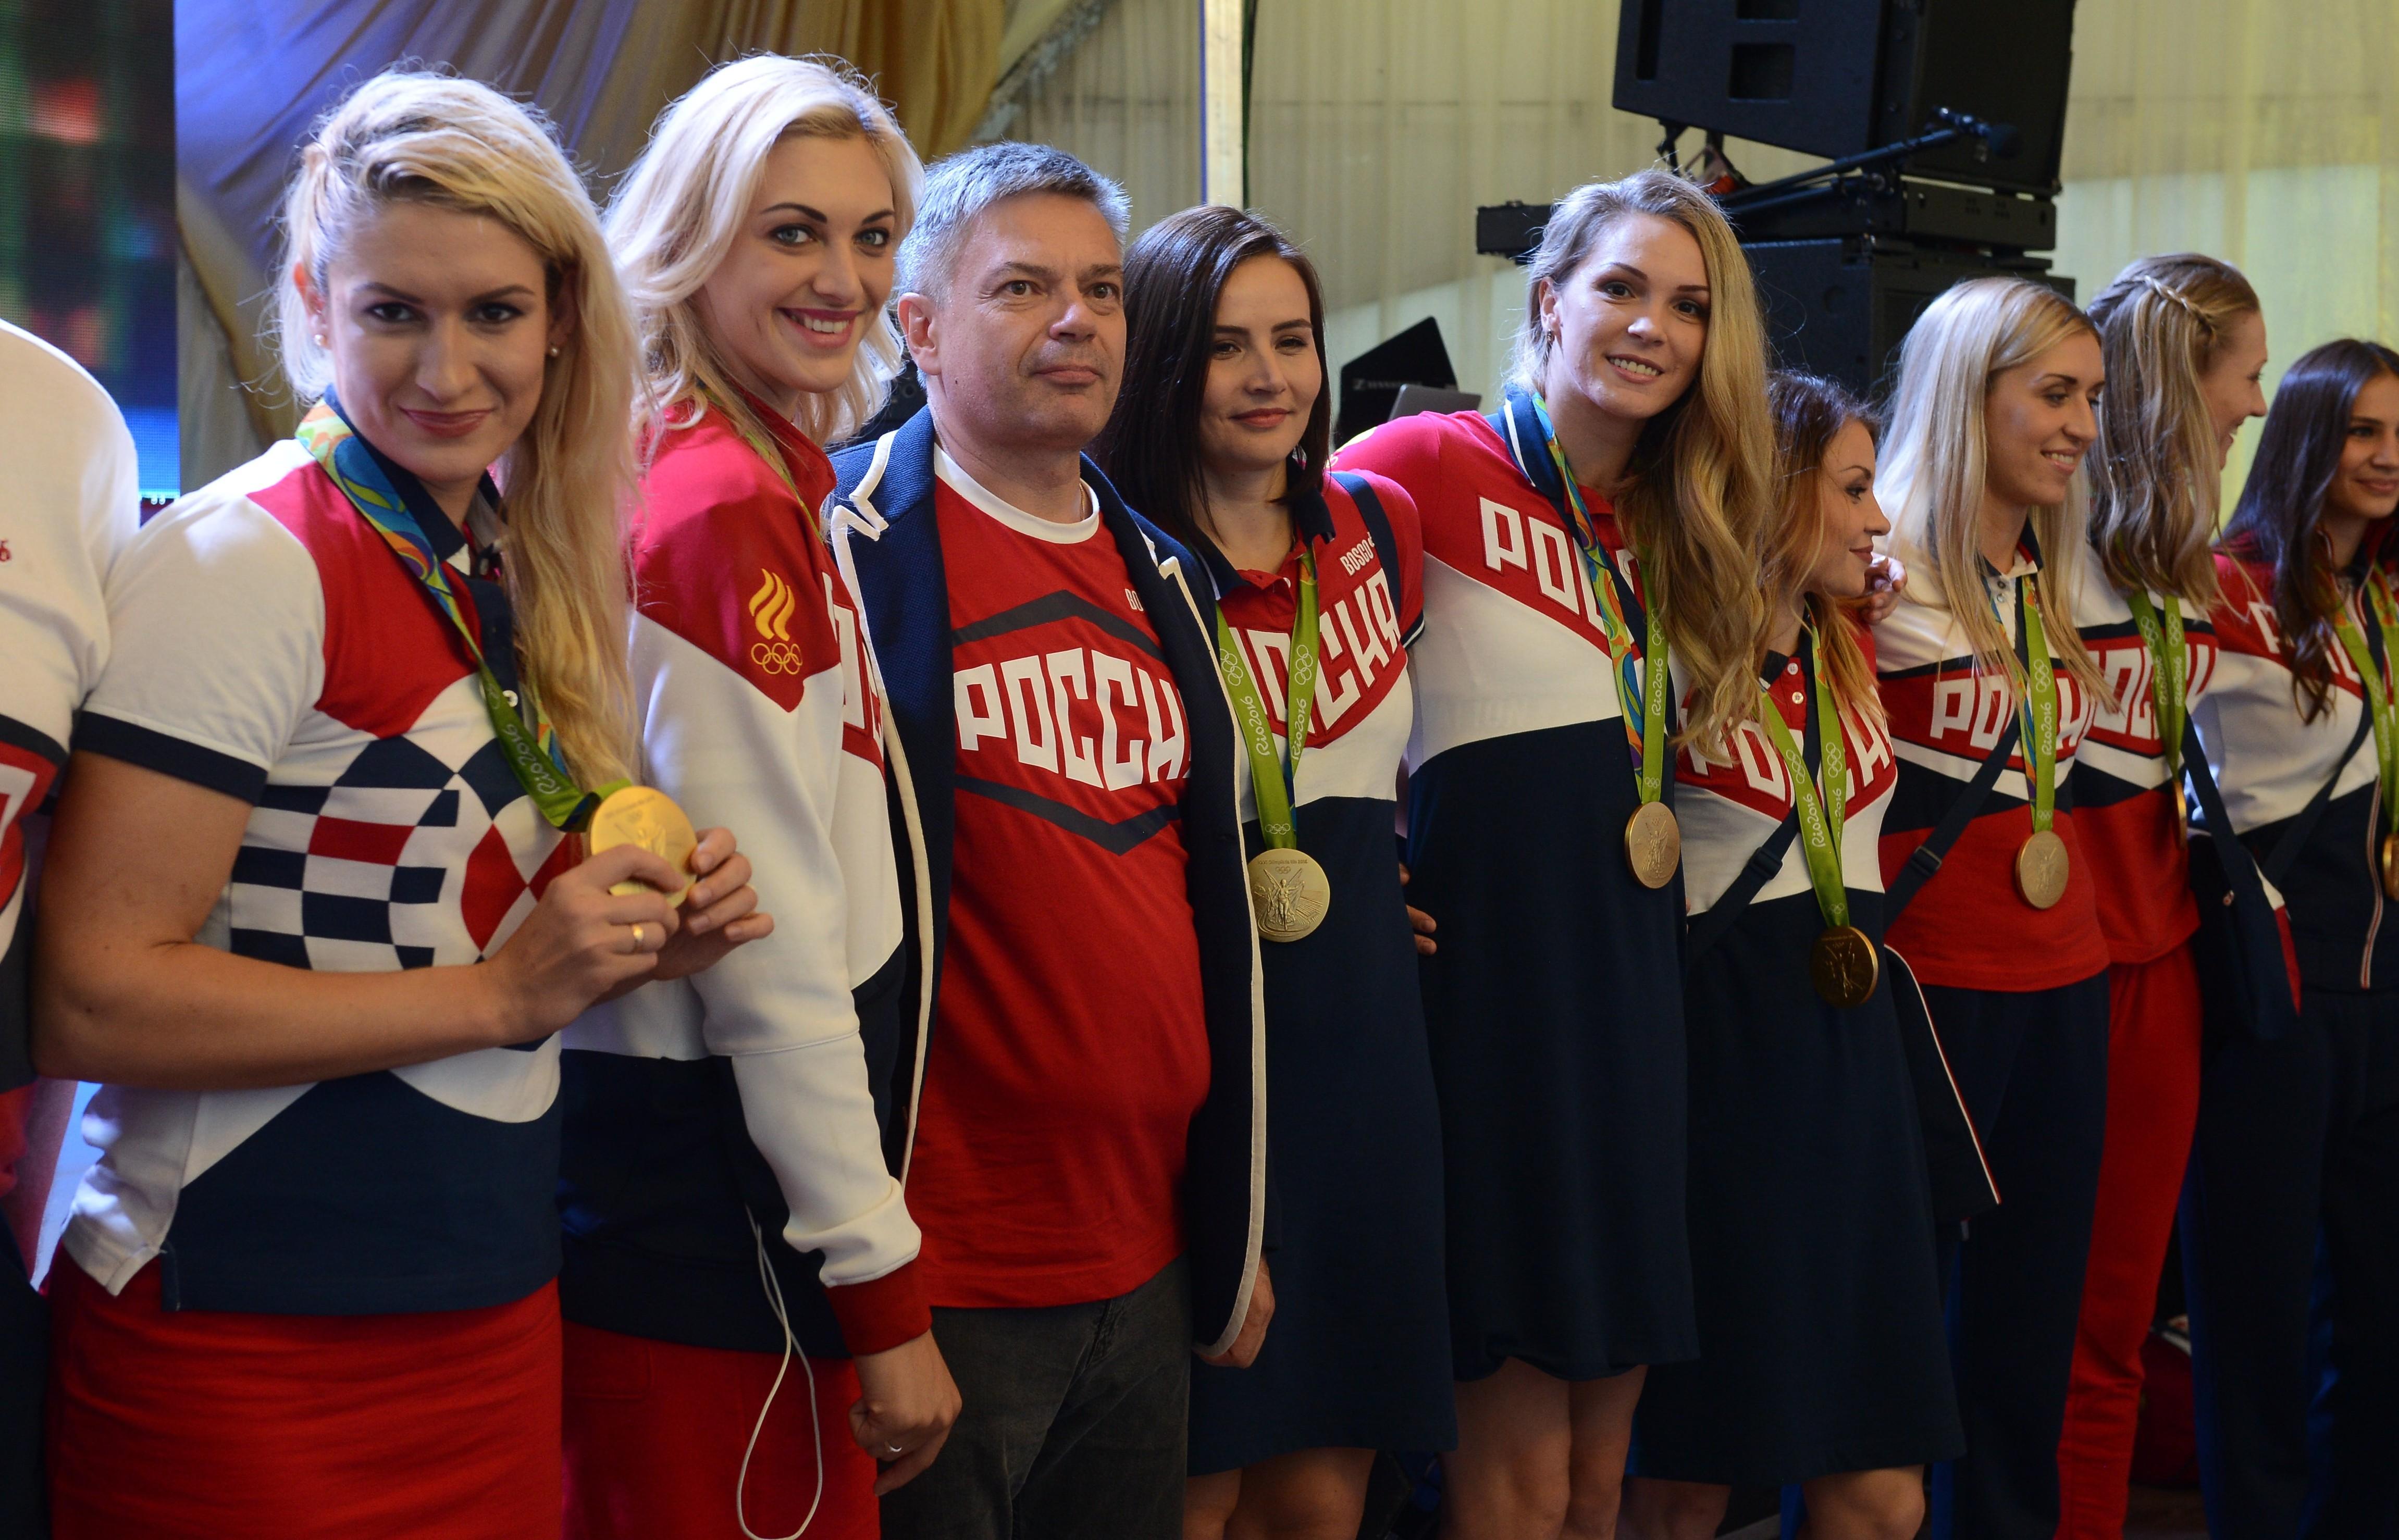 <p>Фото: &copy; РИА Новости/Сергей Мамонтов</p>